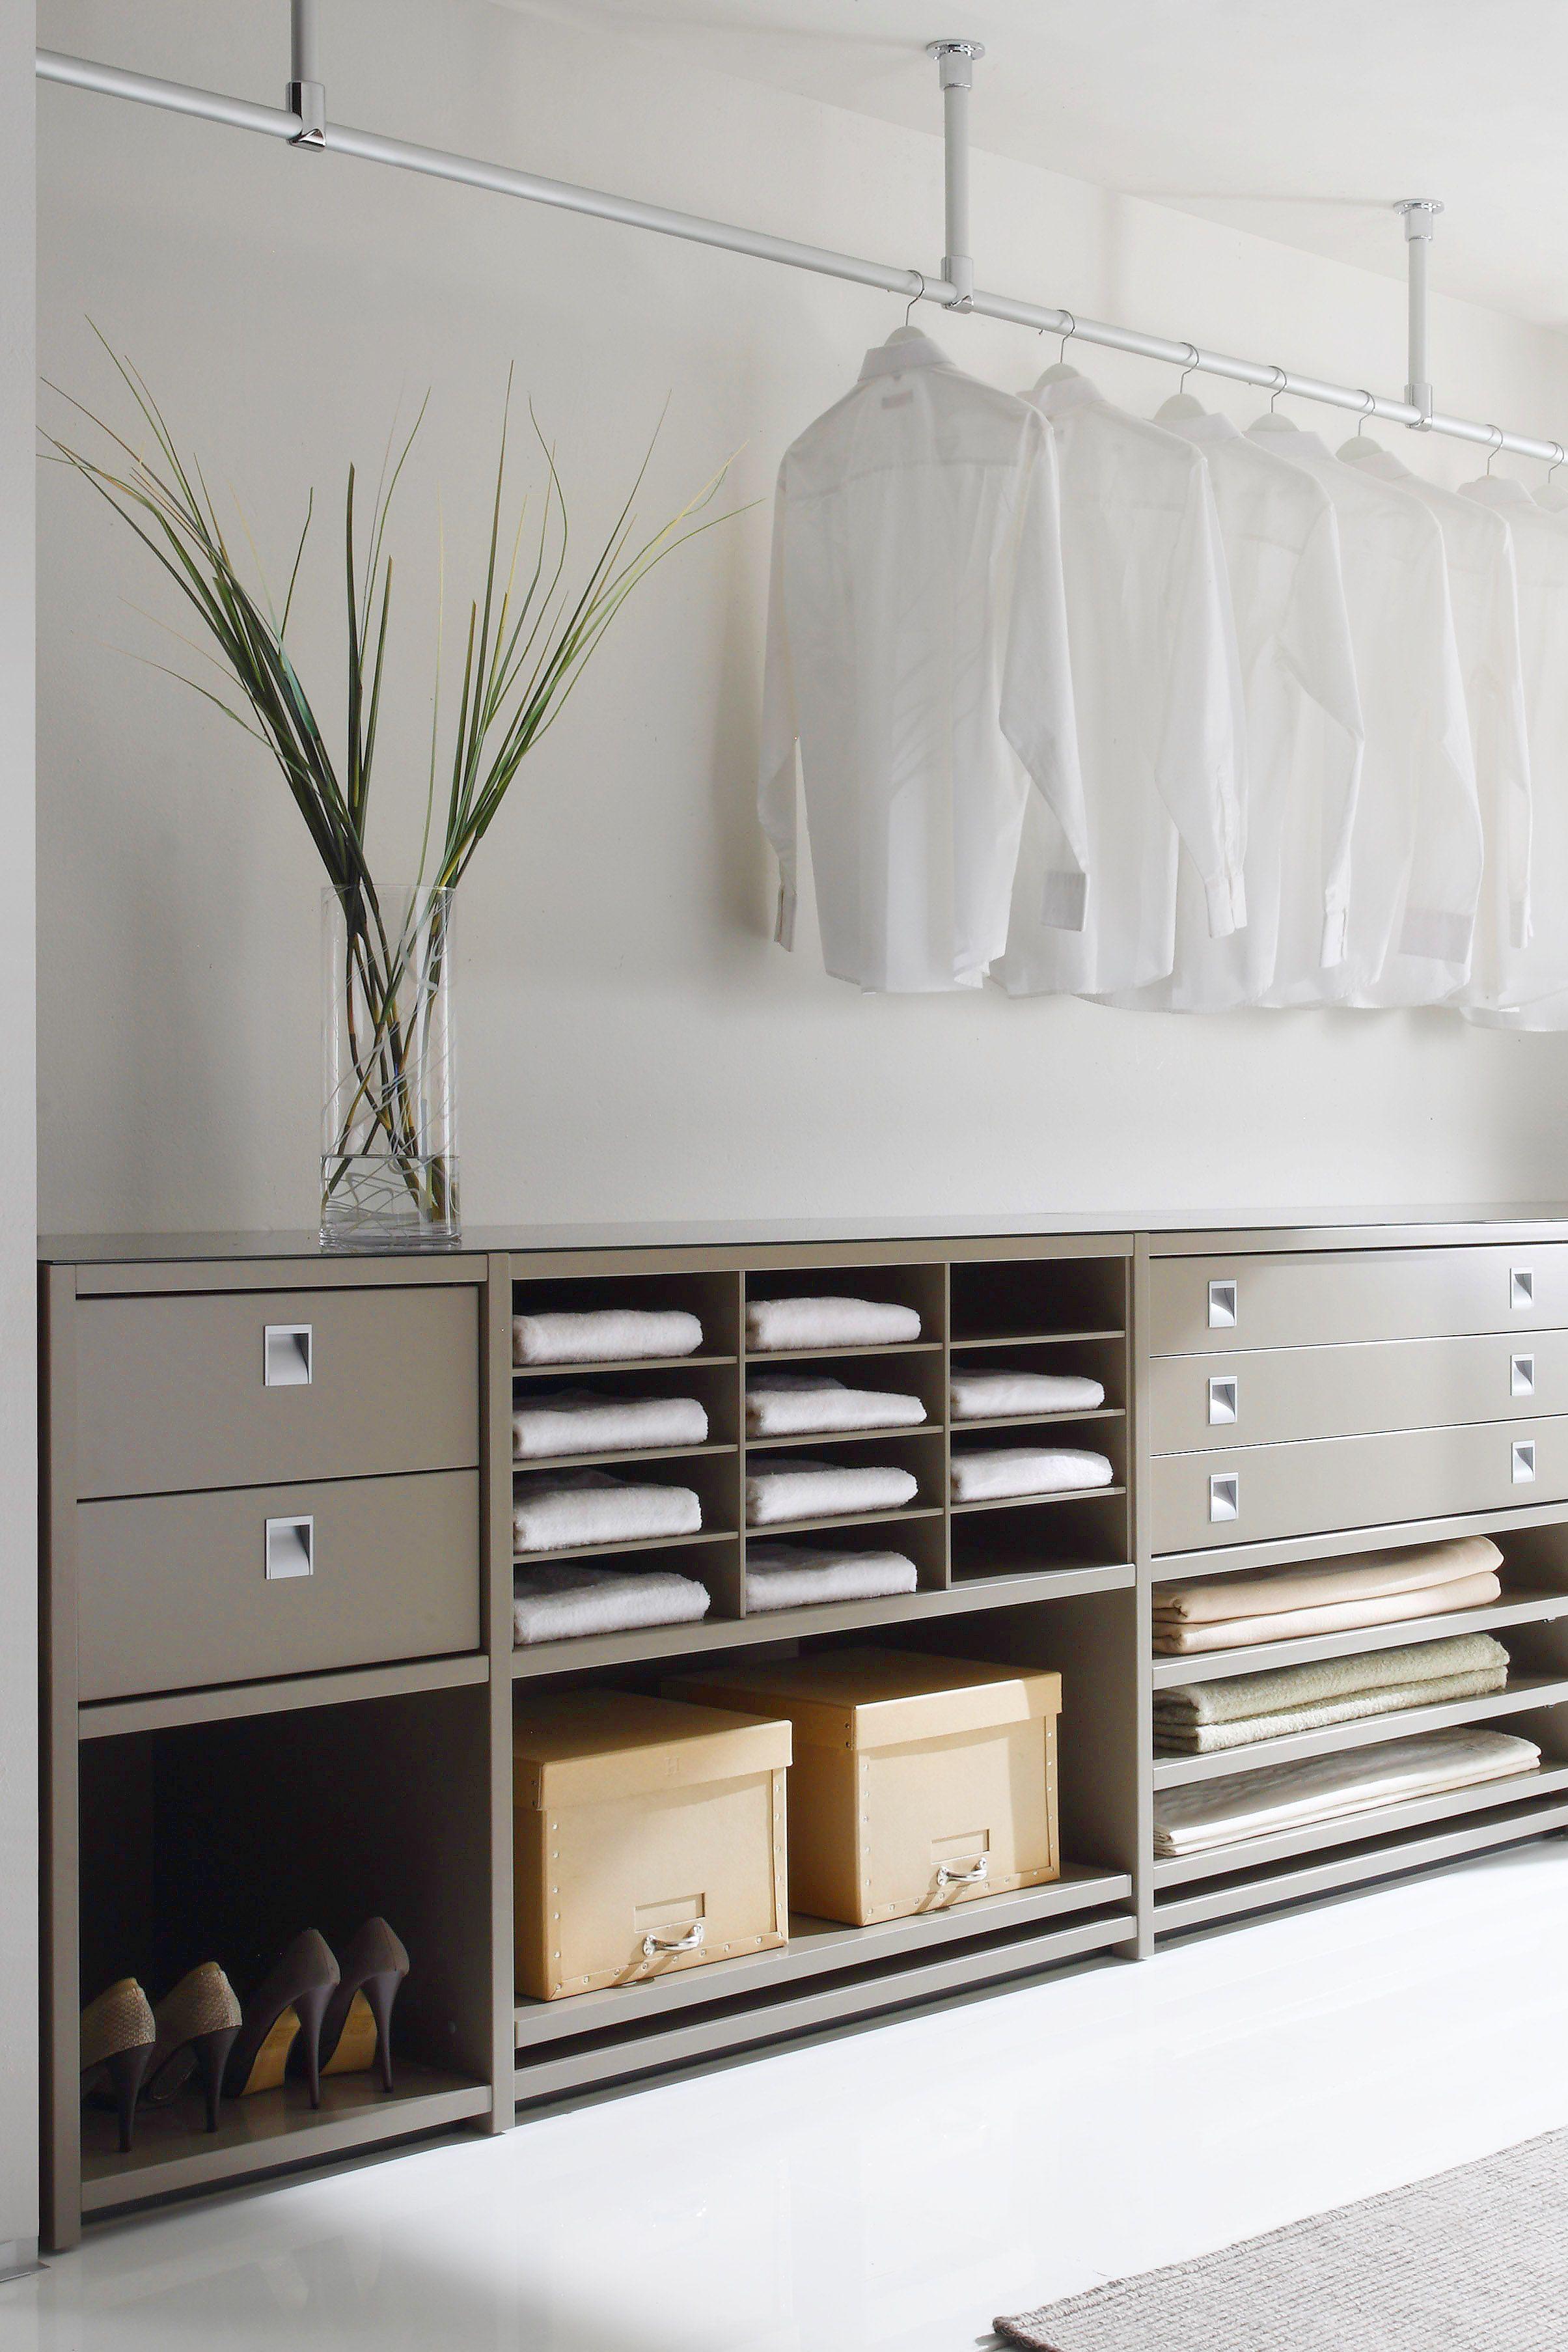 kleiderstange f r schrank kleiderstange einzigartig lebendig kleiderstange design mobel. Black Bedroom Furniture Sets. Home Design Ideas